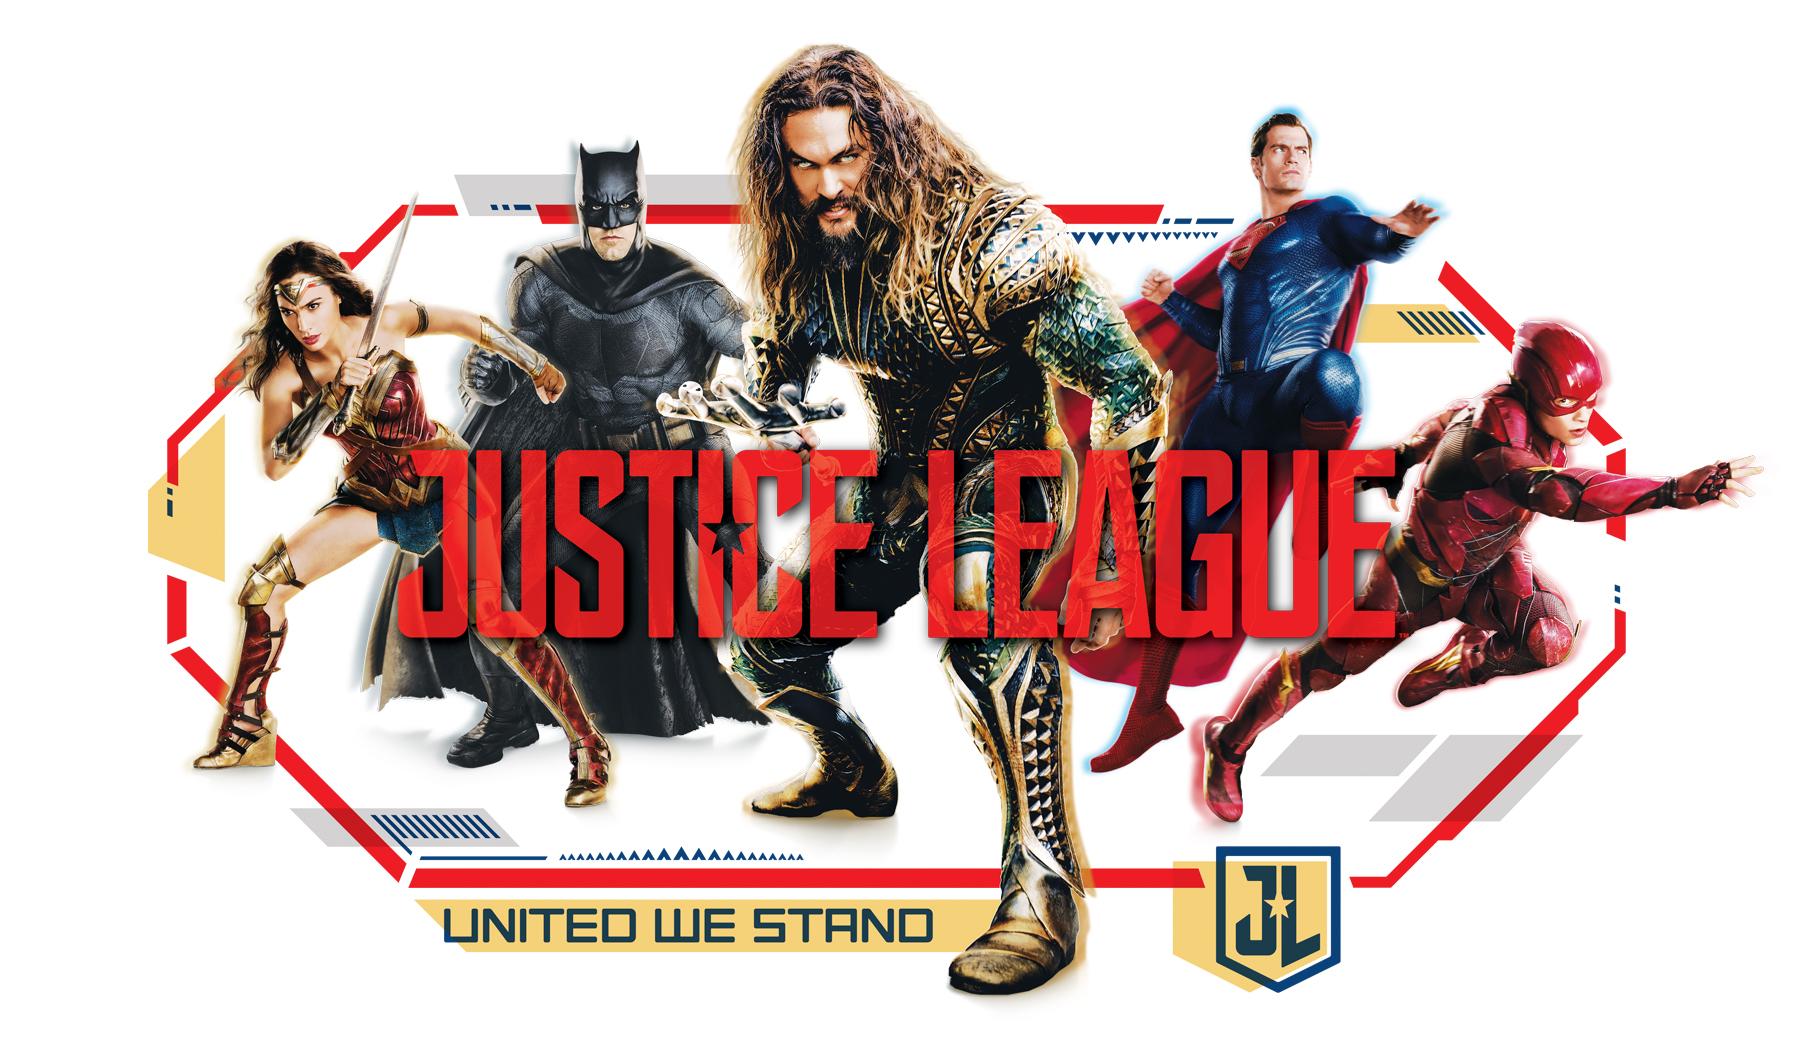 Justice League Style Guide Design - Panel 2